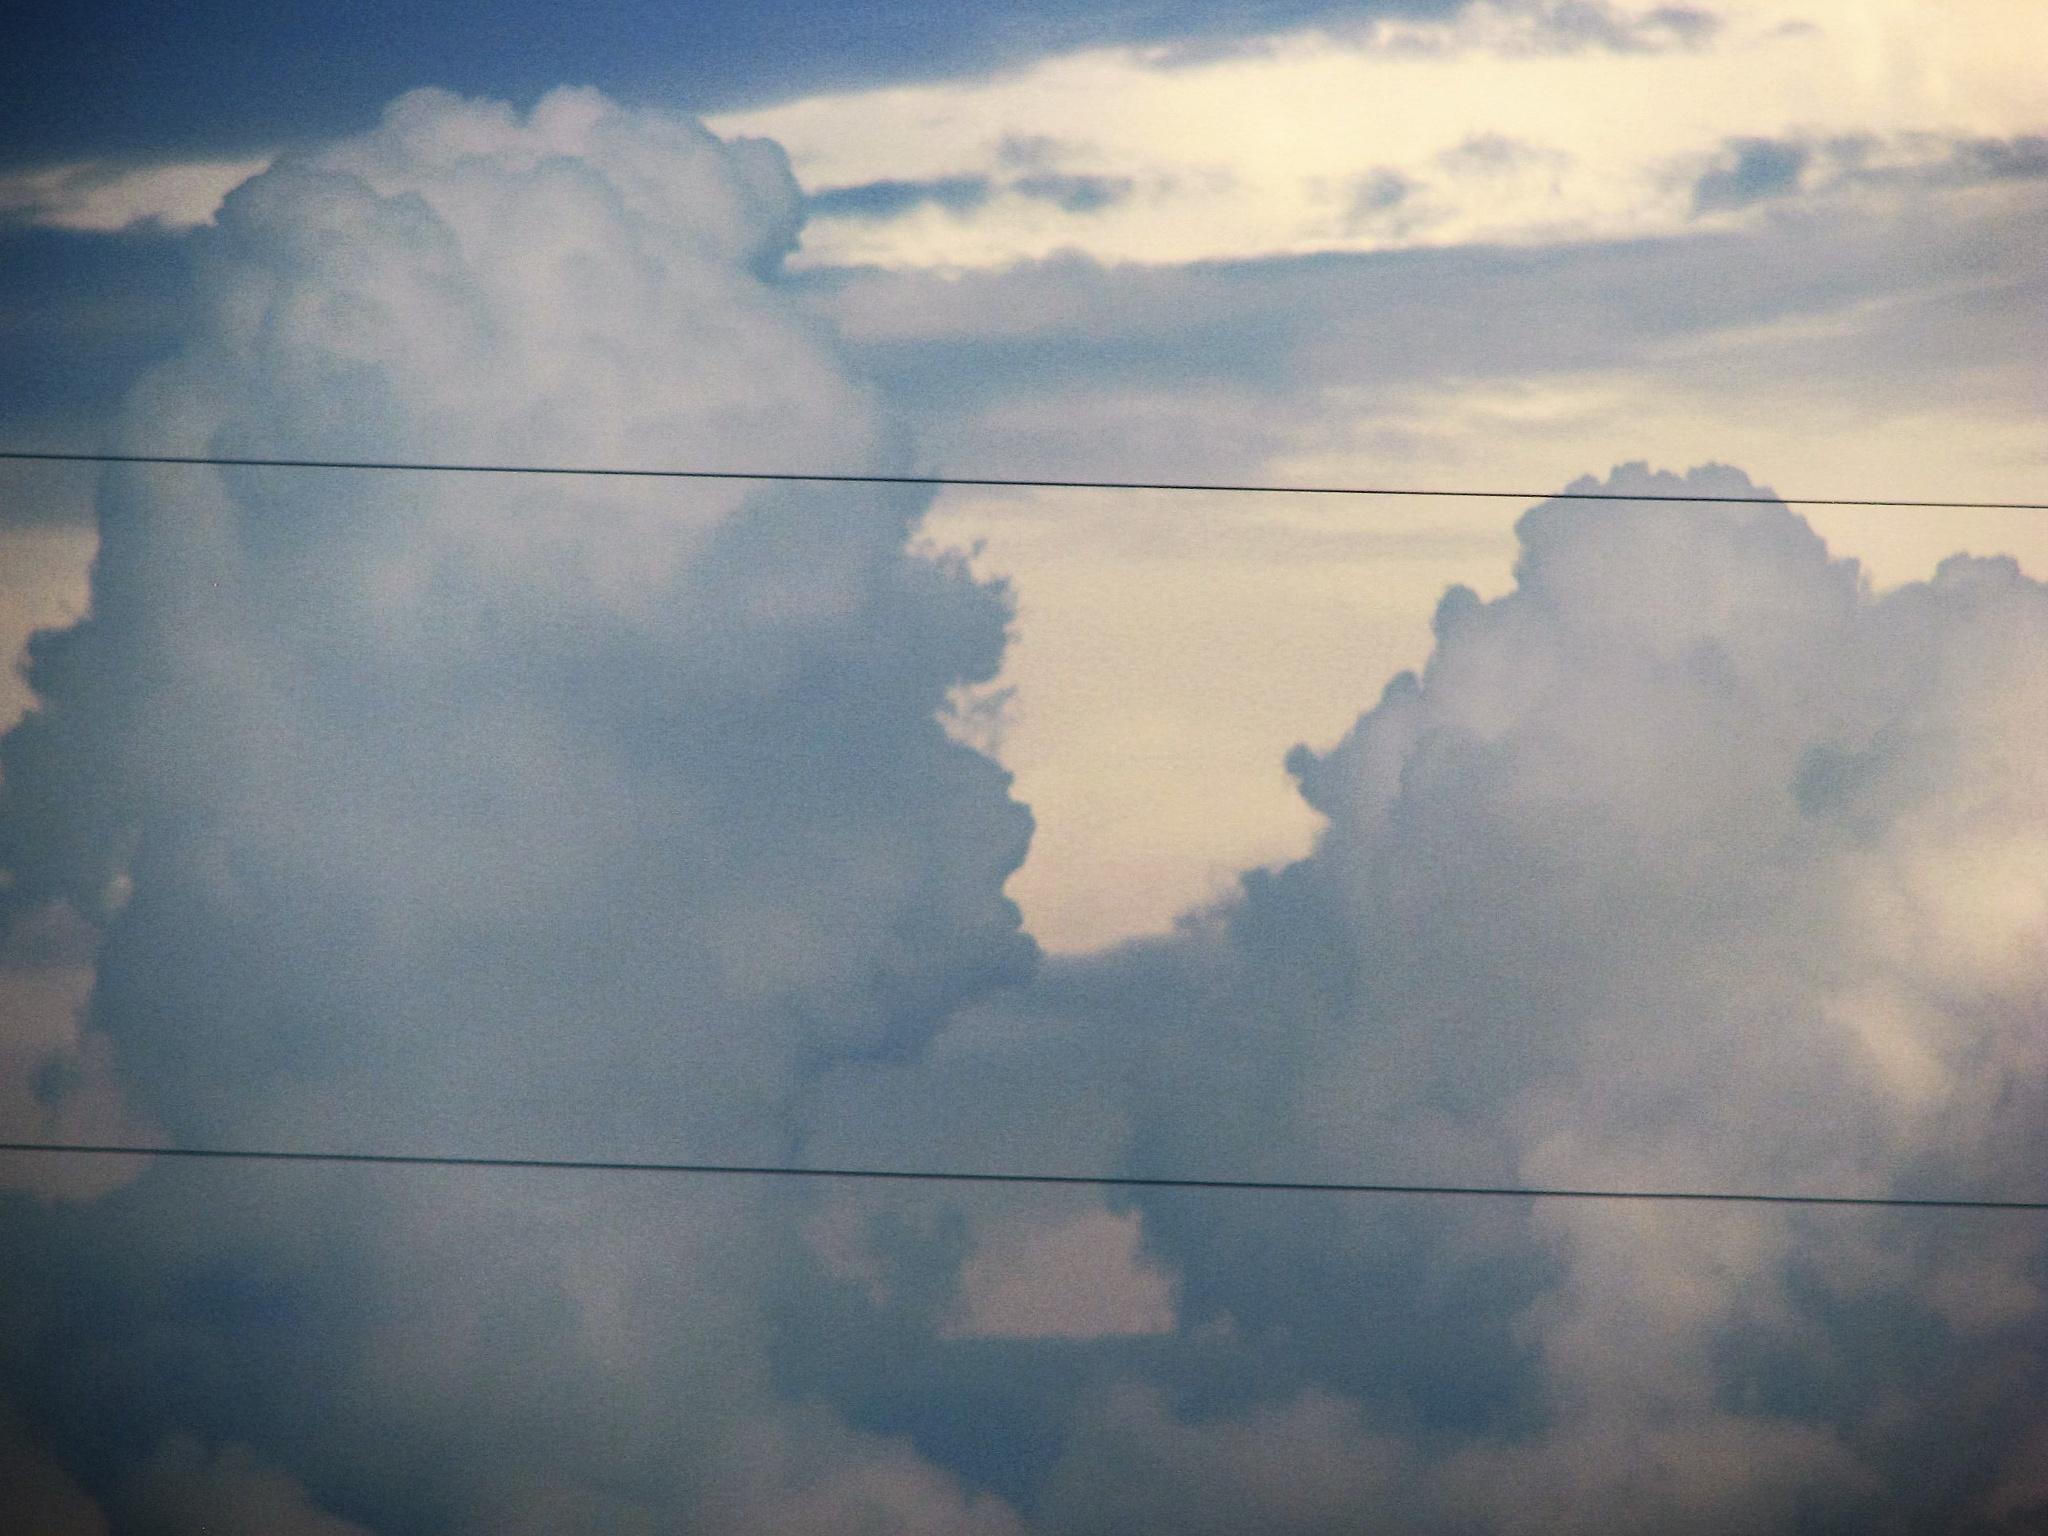 Stormy Evening by nelda.sue